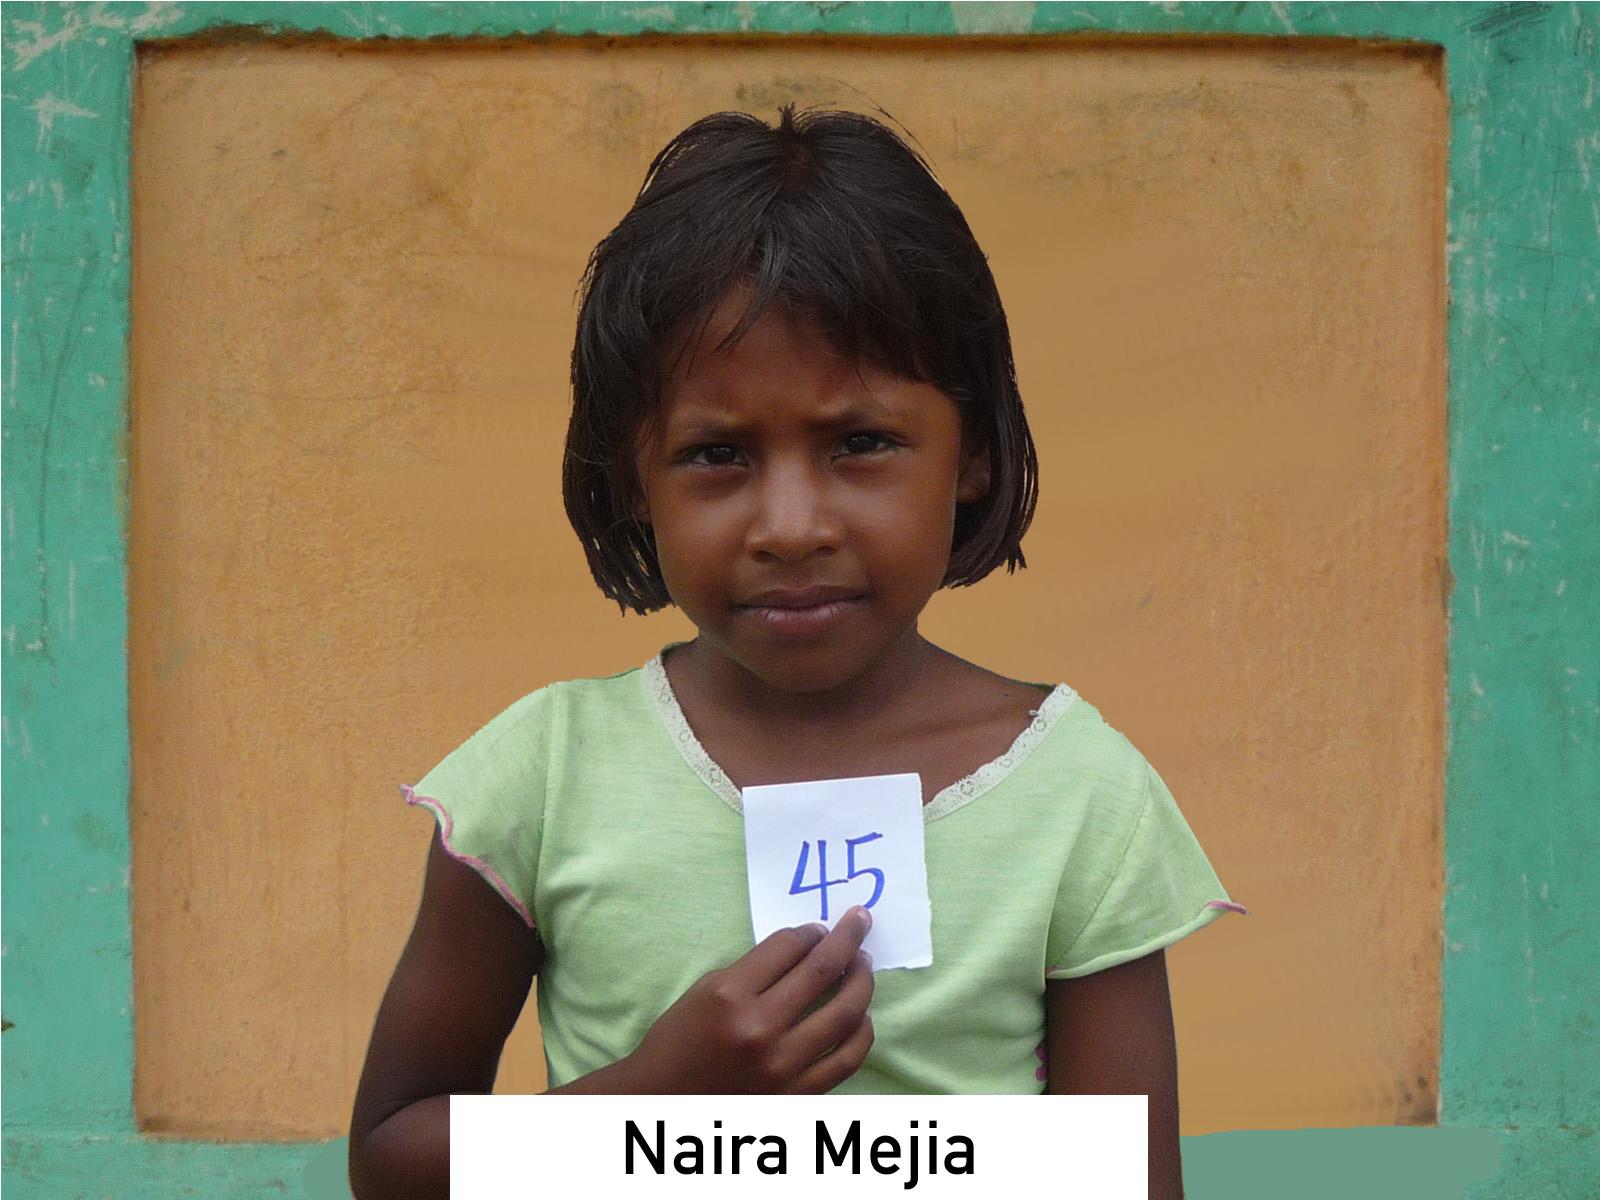 045 - Naira Mejia.jpg